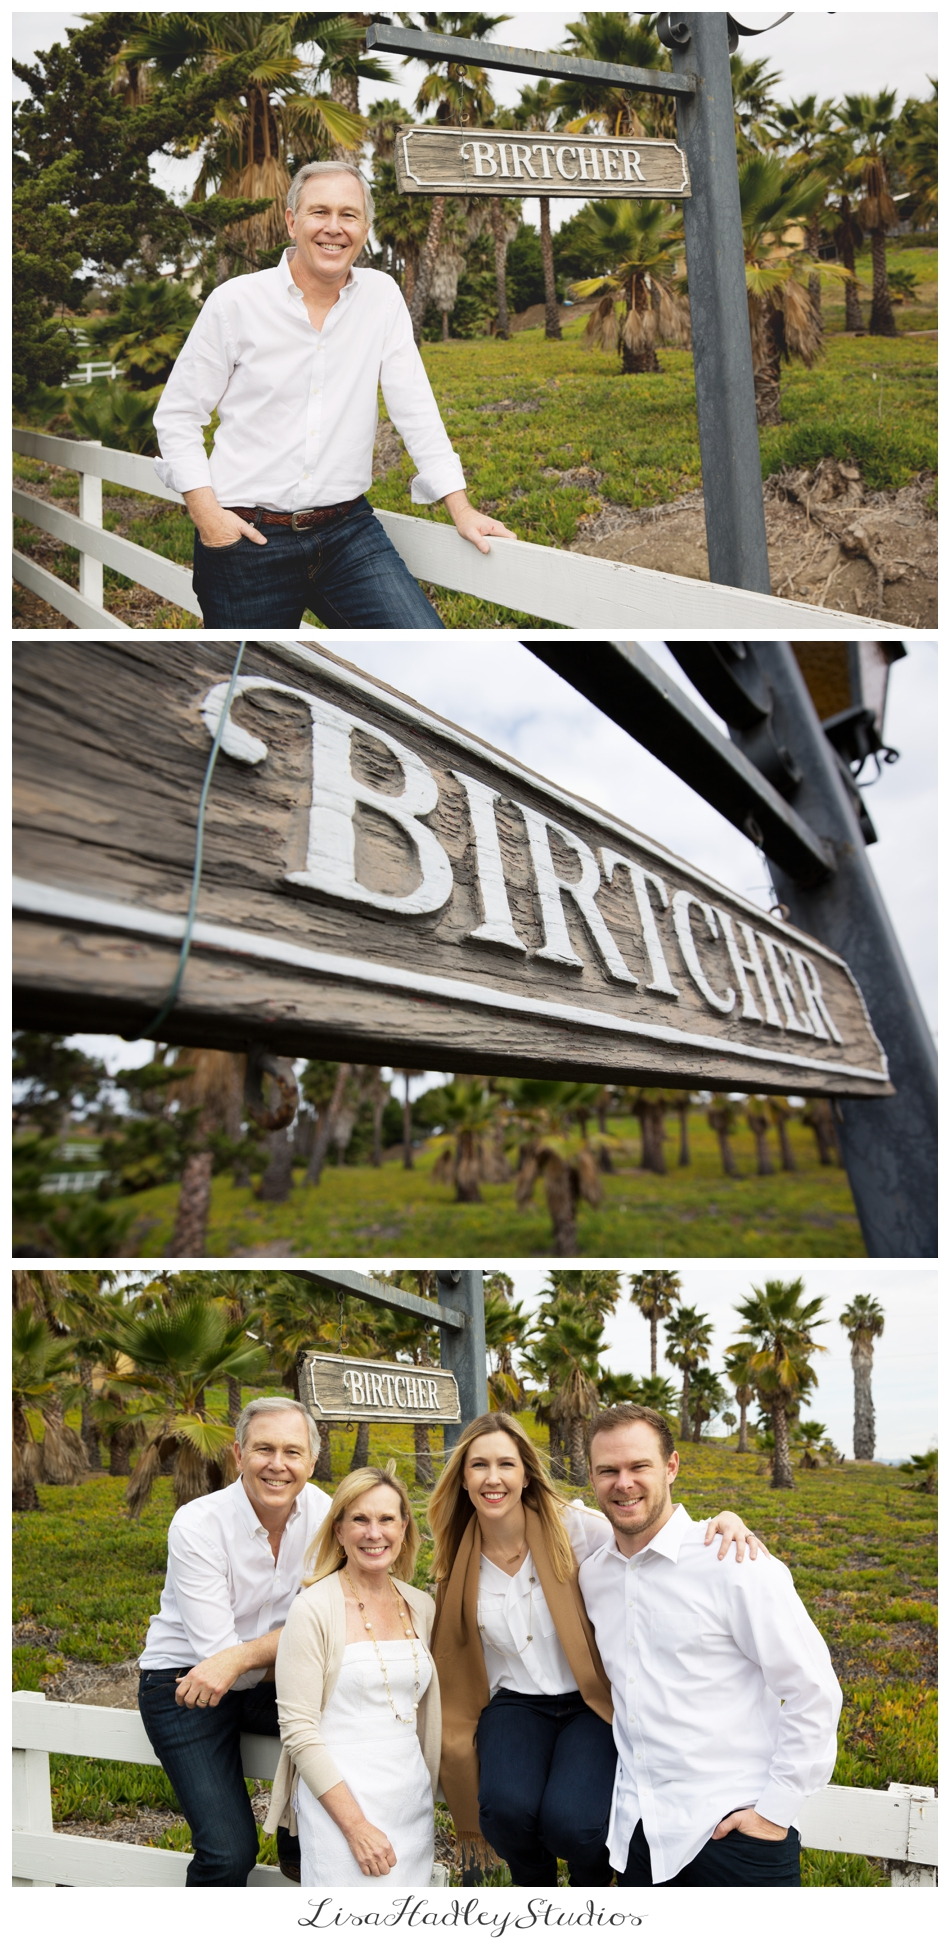 Lisa Hadley Studios Orange County Family Photos